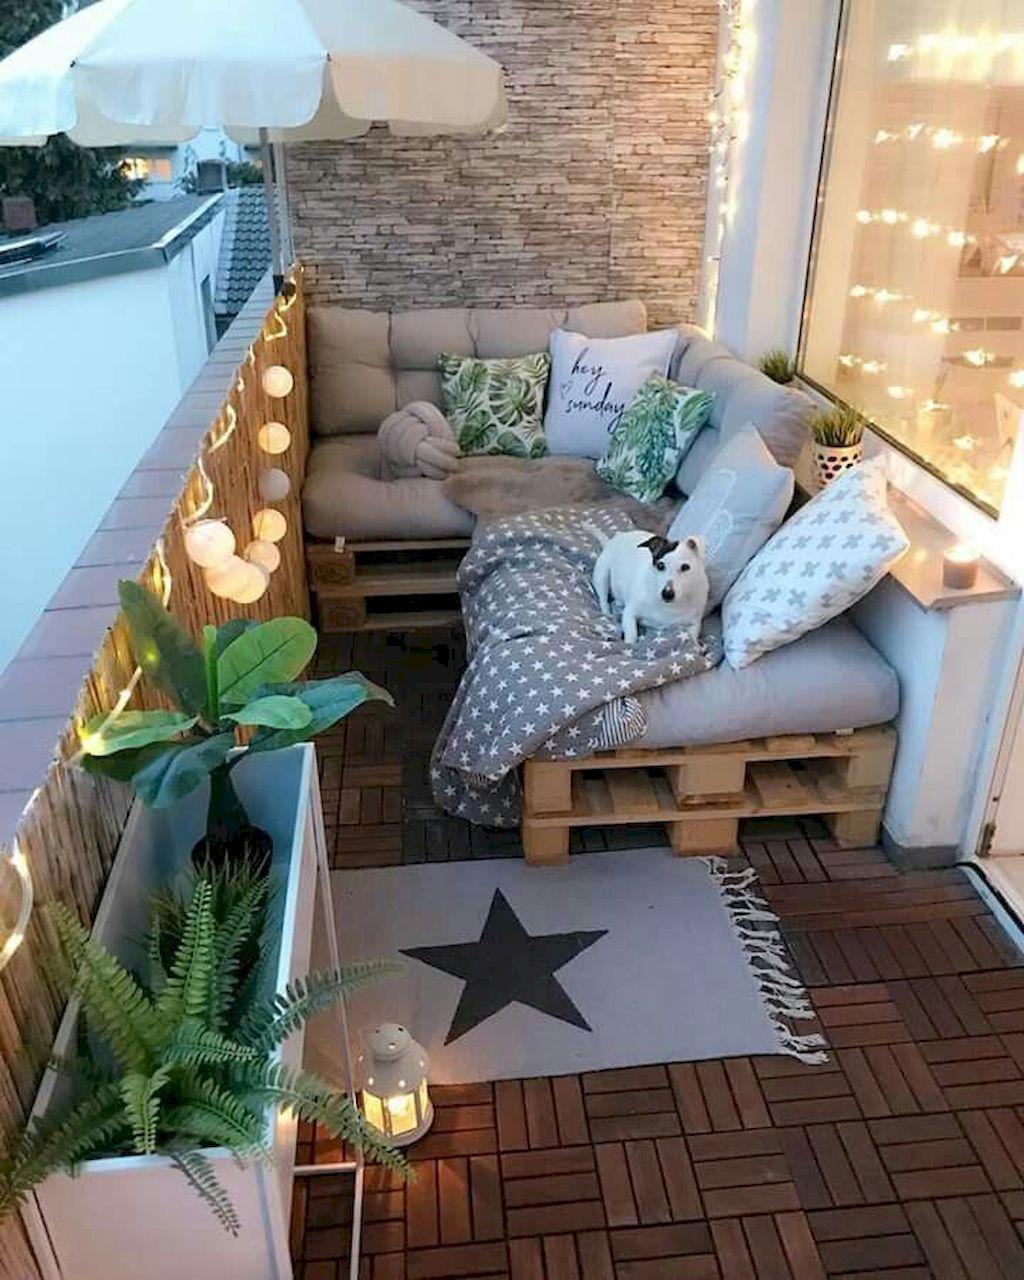 75 Cozy Apartment Balcony Decorating Ideas images